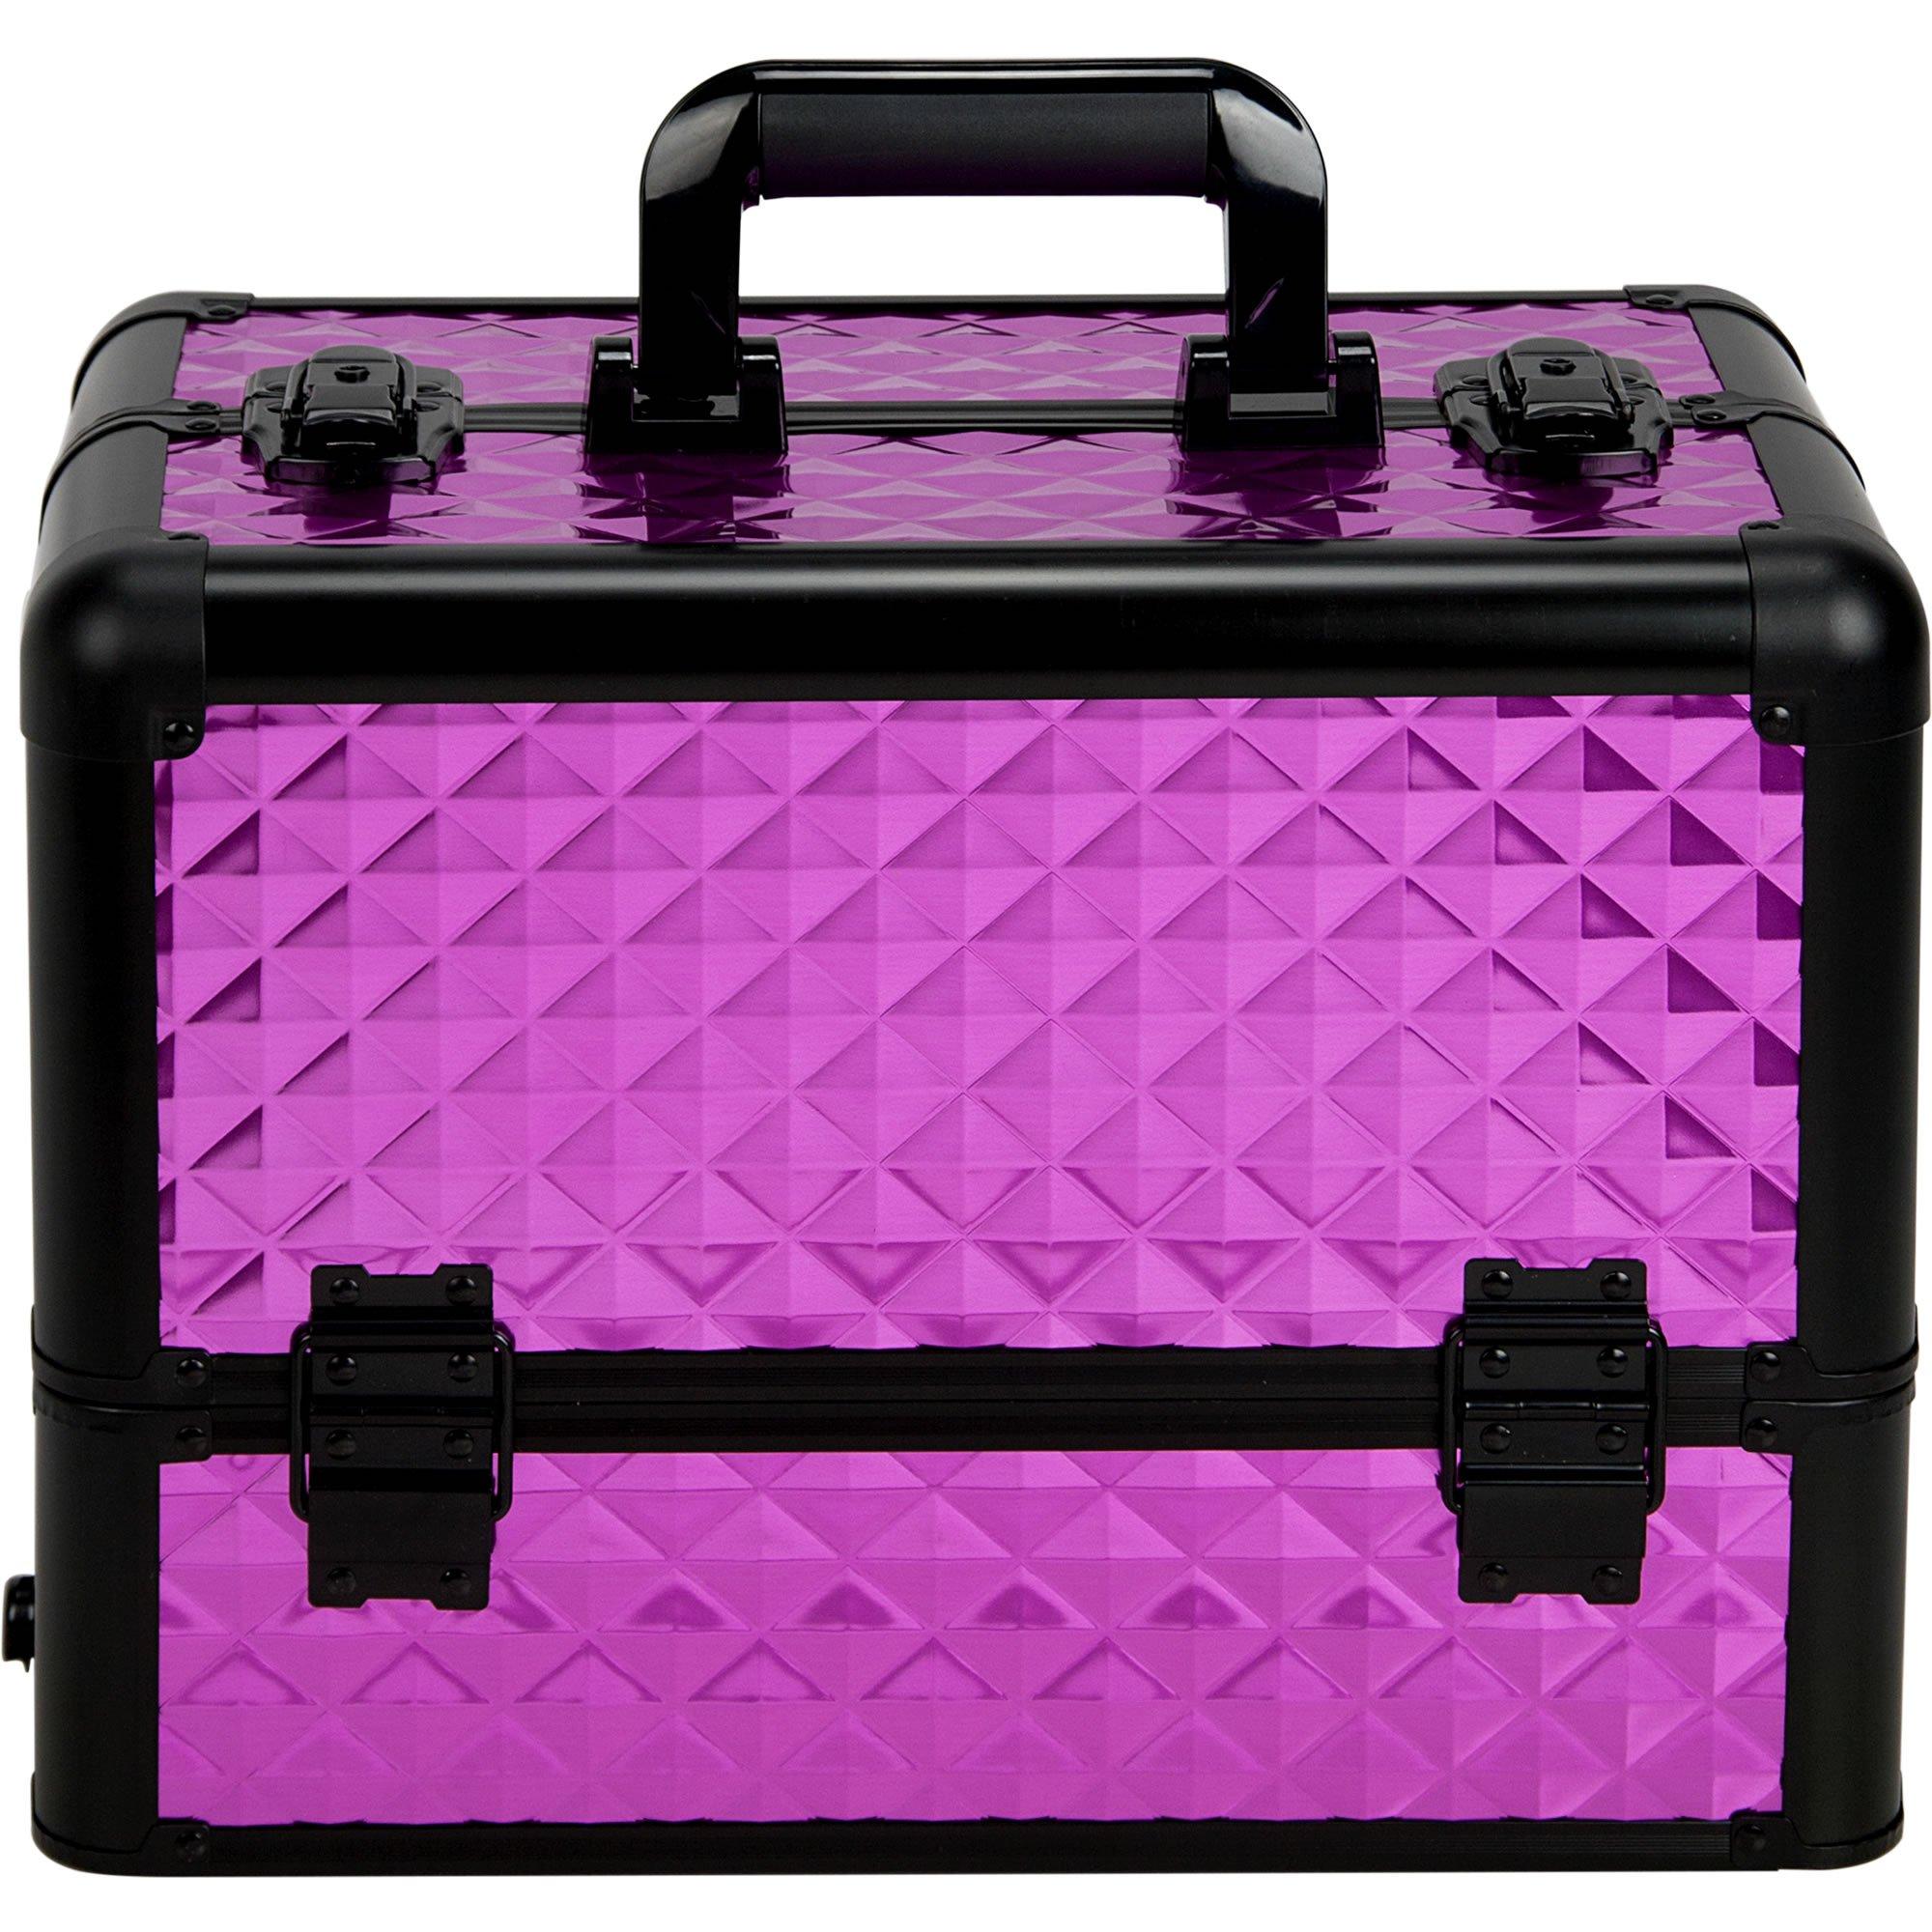 Sunrise Dona Heavy Duty Makeup Case Professional Nail Travel Organizer Box, Purple Diamond, 9 Pound by SunRise